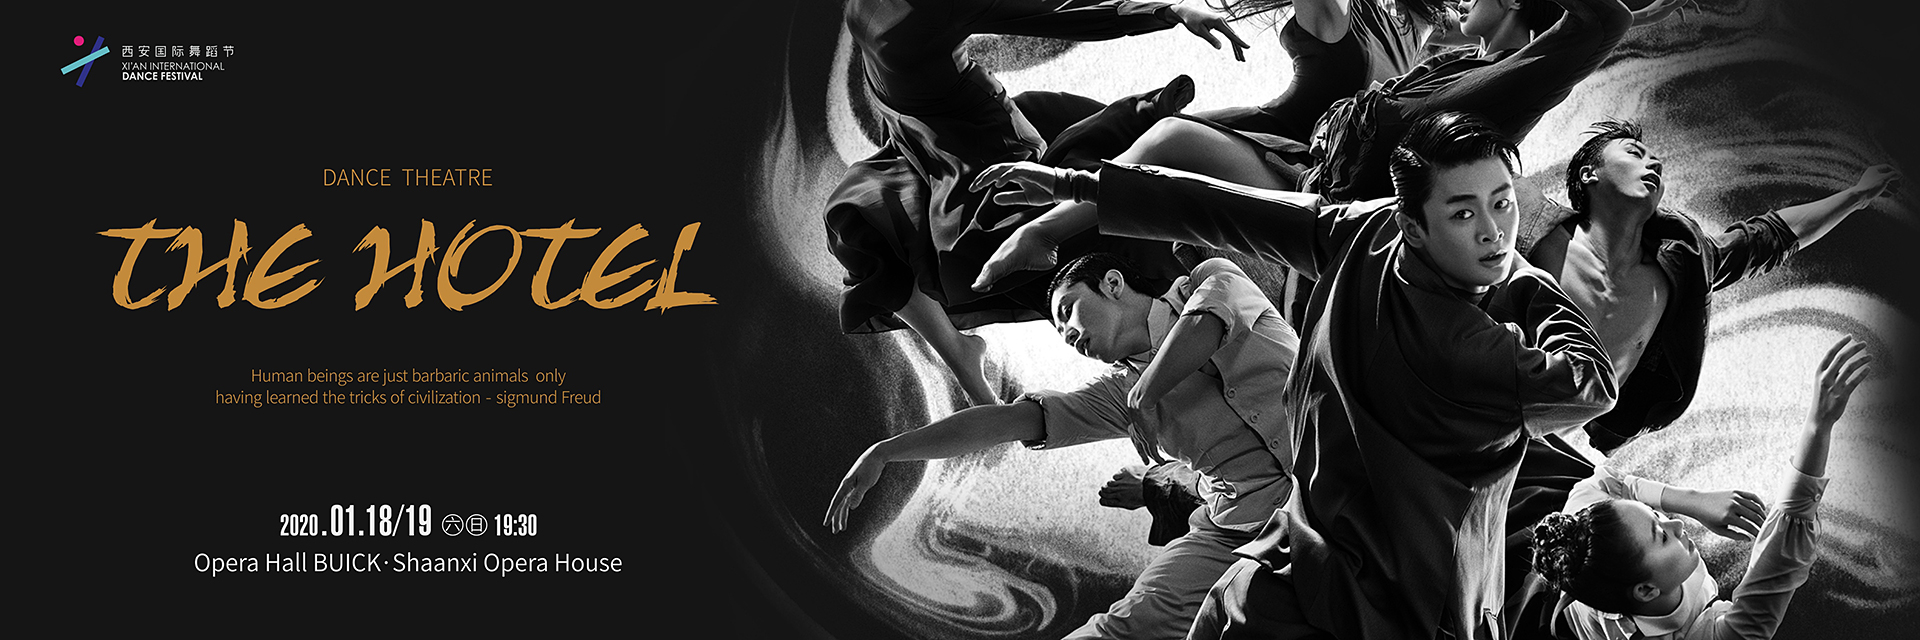 Dance Theatre --- The Hotel by Li Xing Studio【2nd Xi'an International Dance Festival】